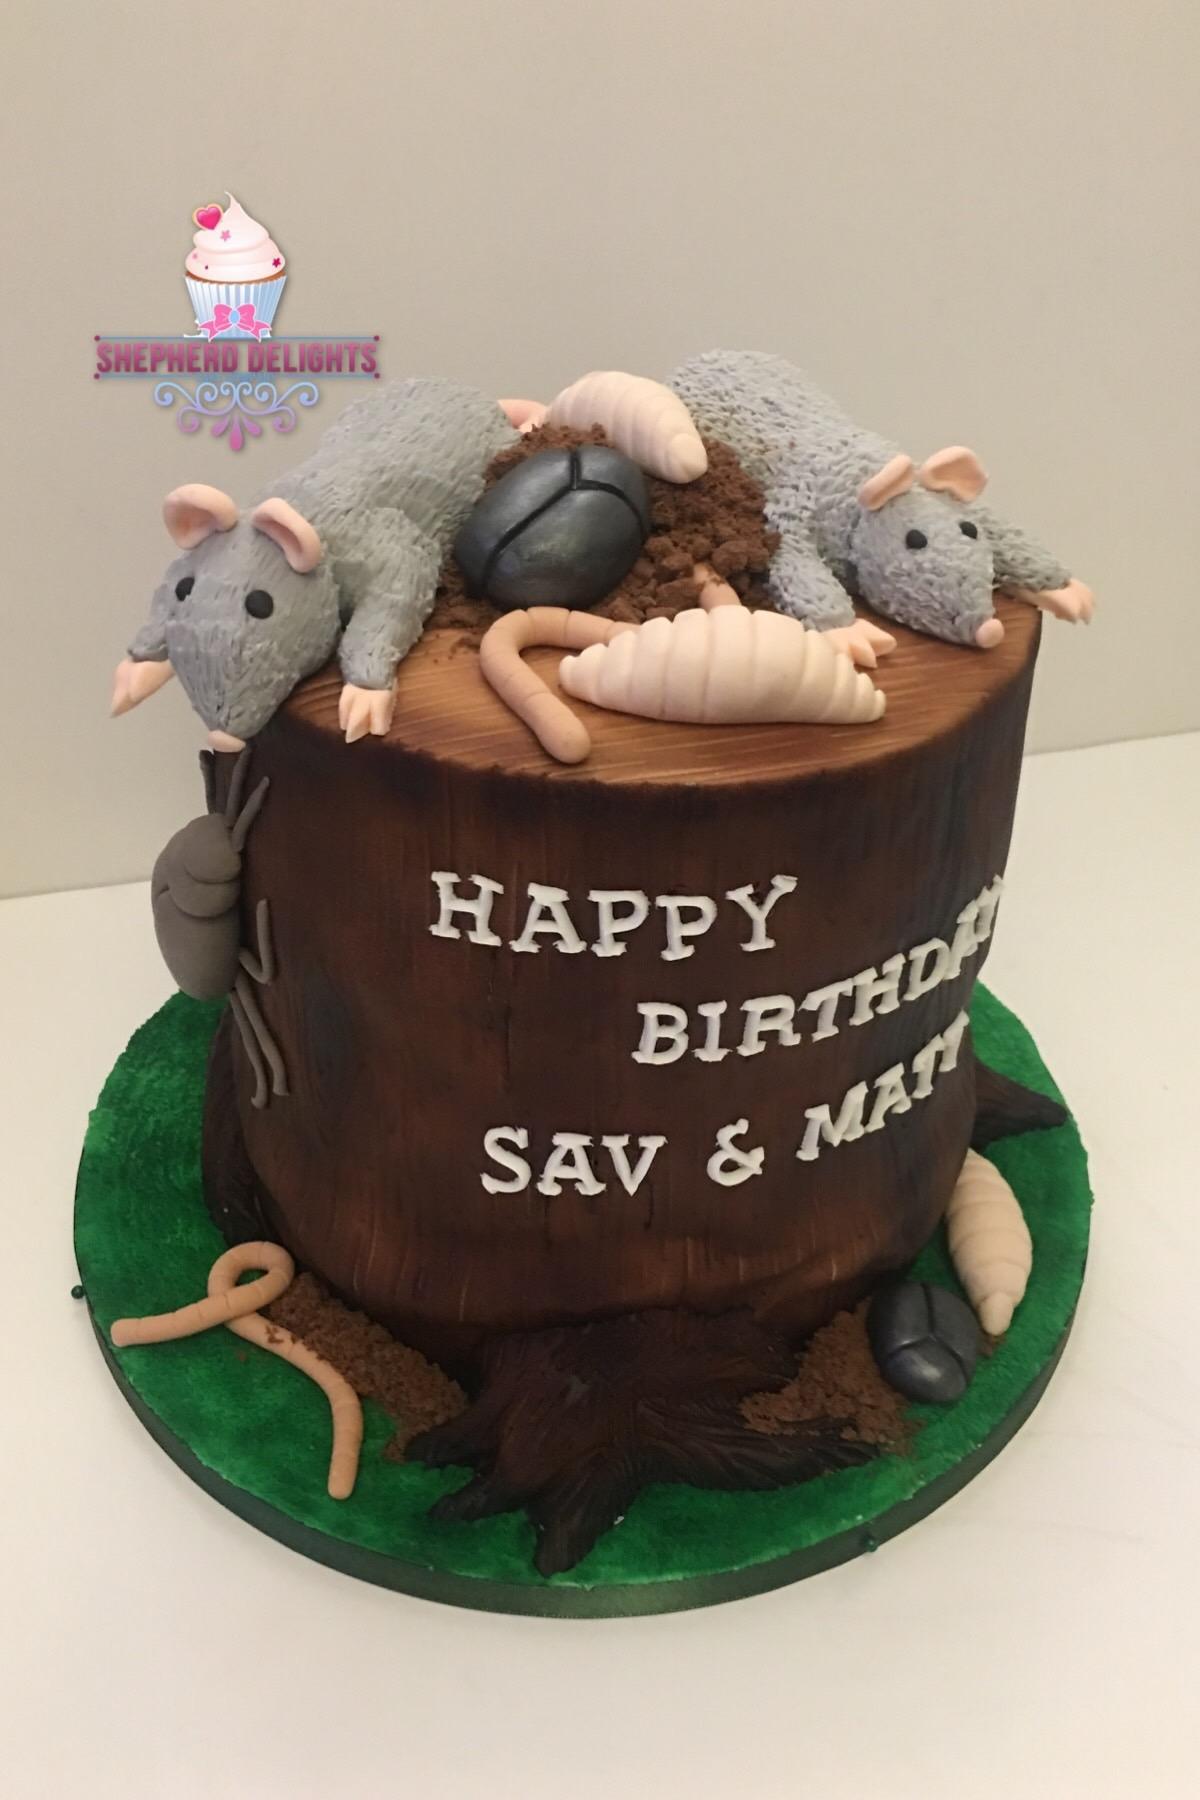 Groovy Tree Stump Bug Novelty Cakes Novelty Birthday Wedding Cakes Funny Birthday Cards Online Overcheapnameinfo